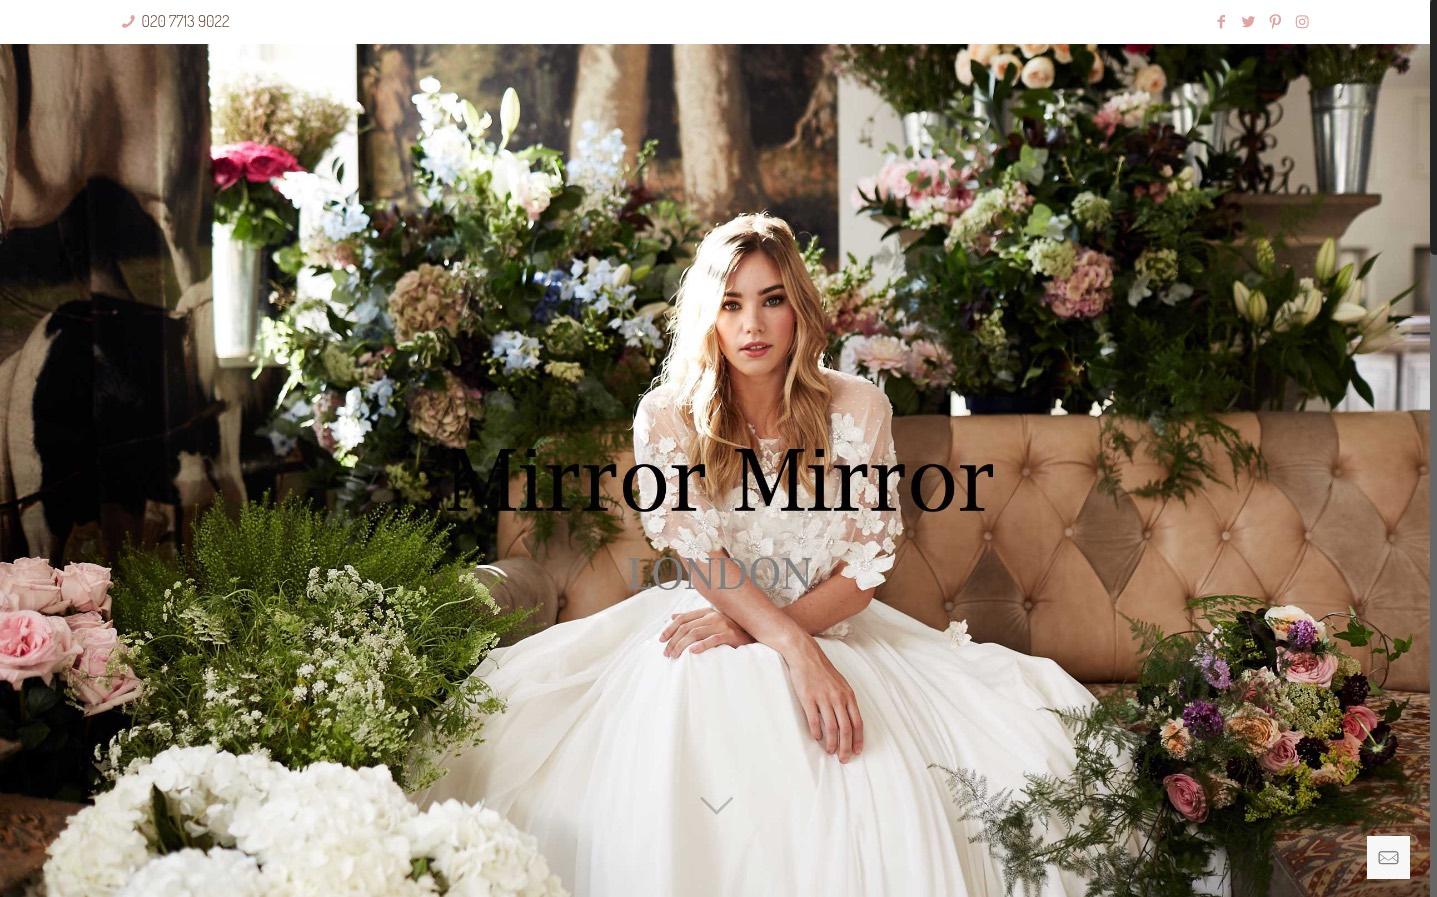 Mirror Mirror Bridal Boutique - Three Girls Media